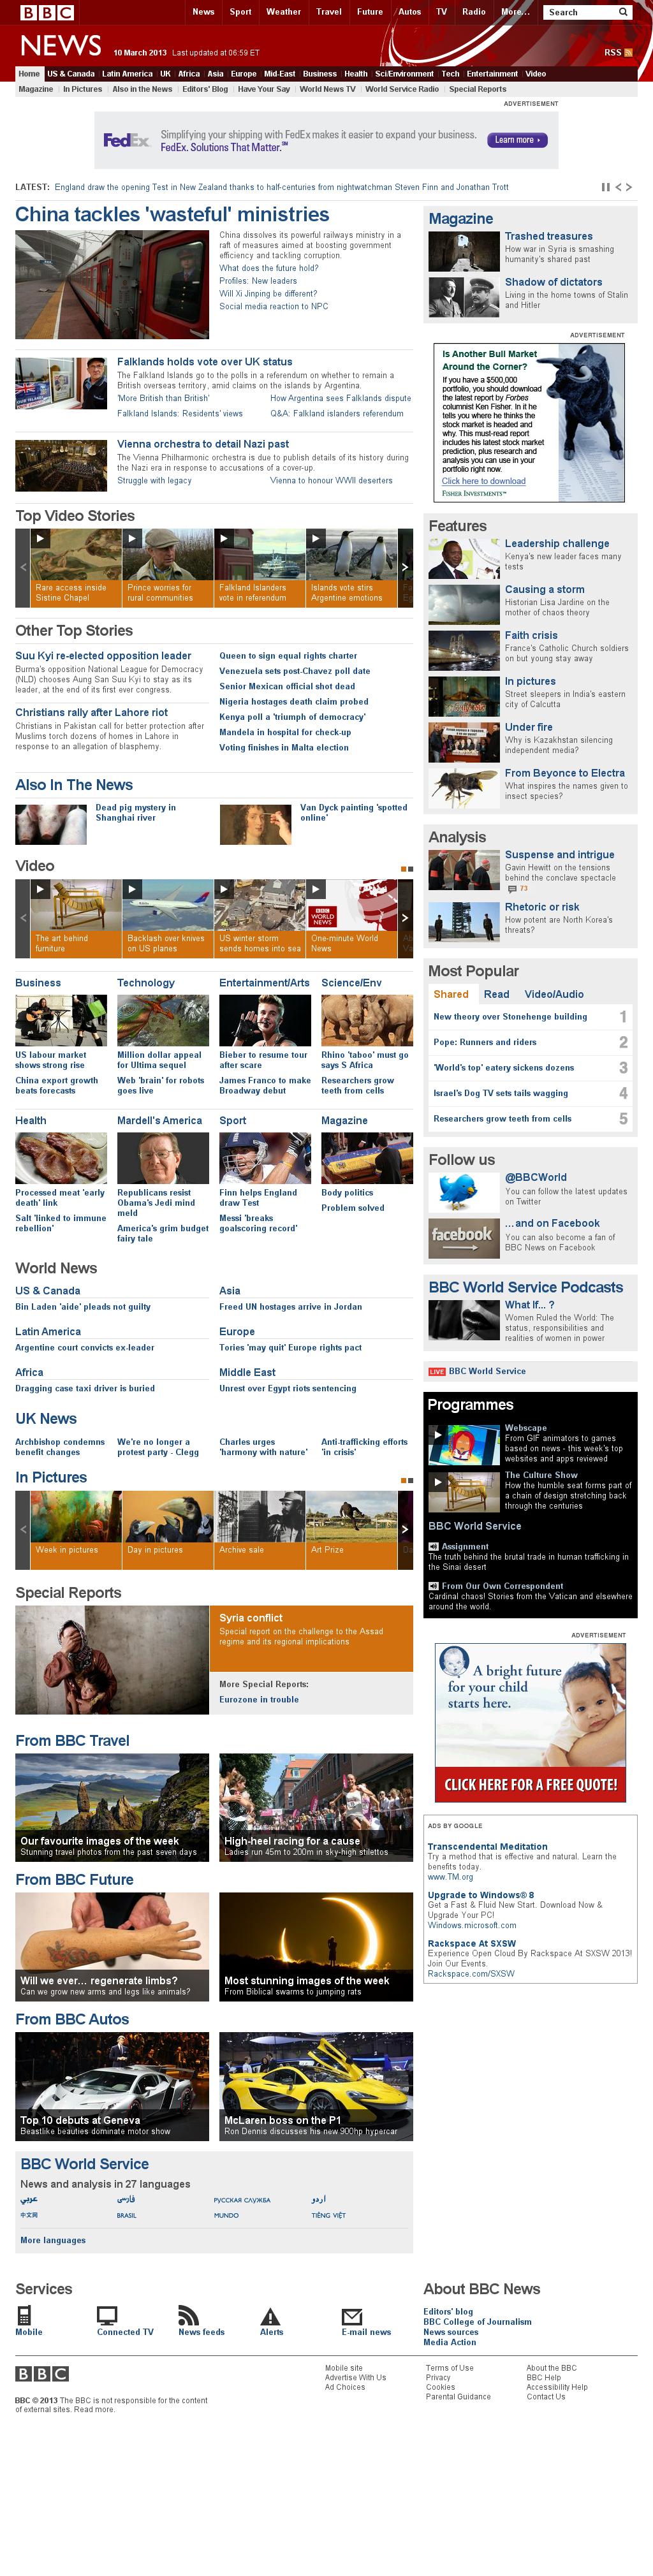 BBC at Sunday March 10, 2013, 11:01 a.m. UTC